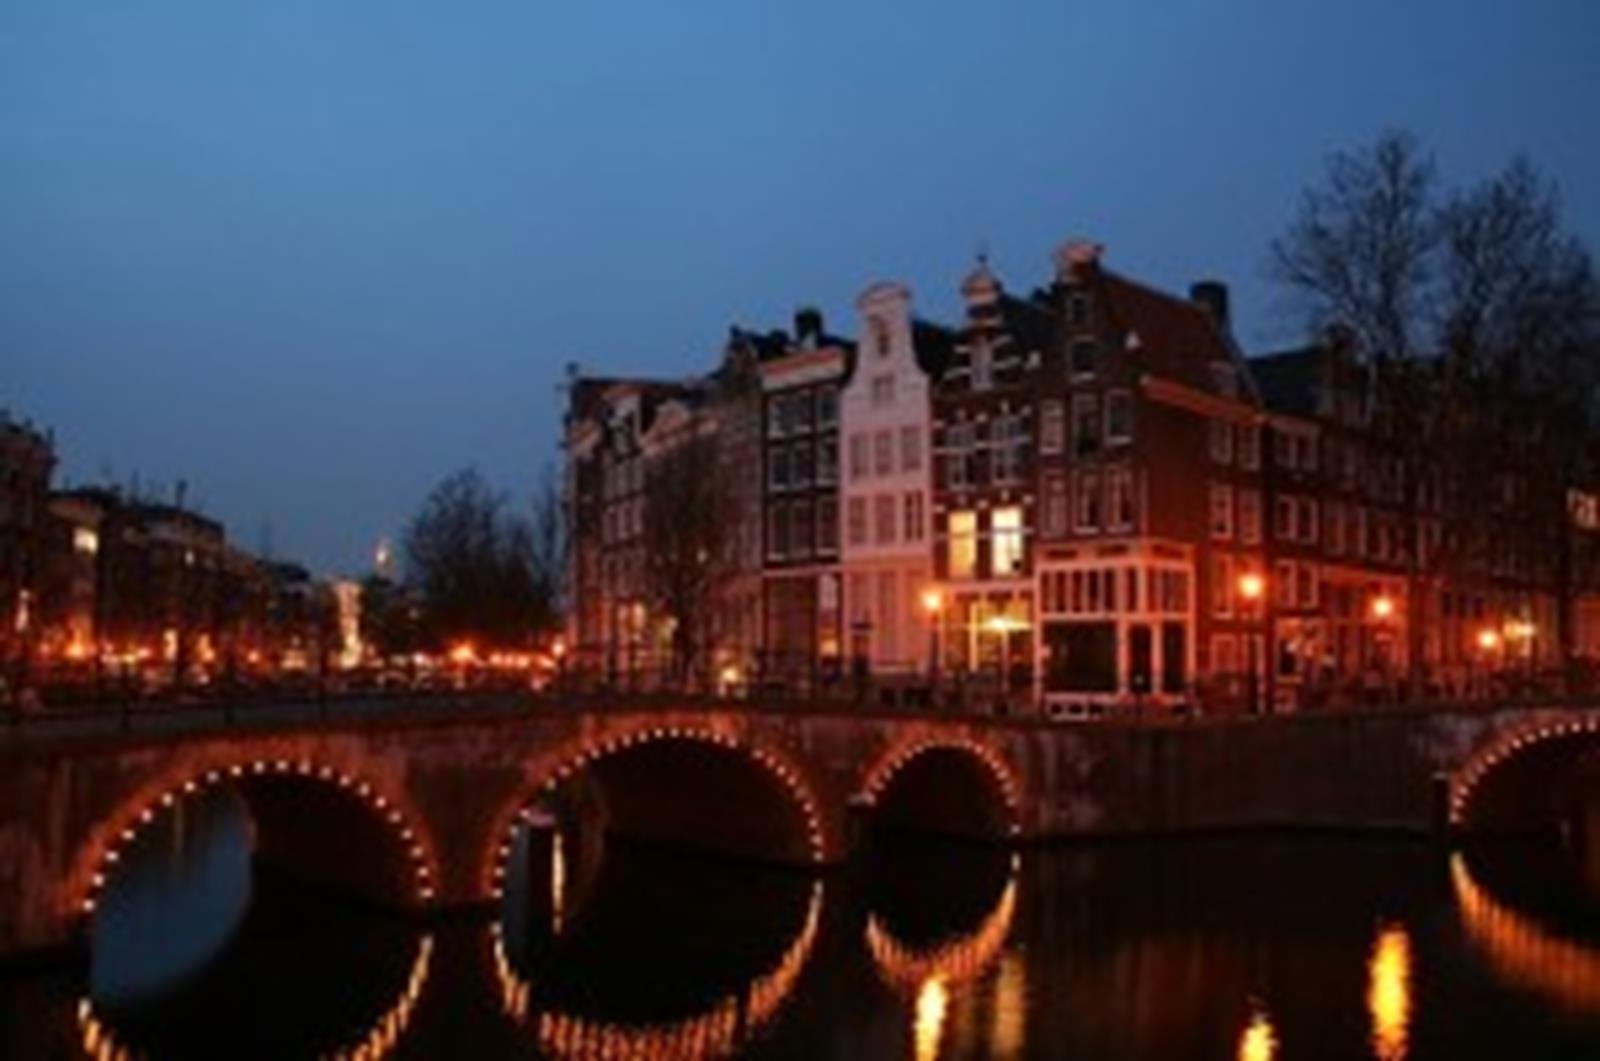 Keizersgracht in Amsterdam at night